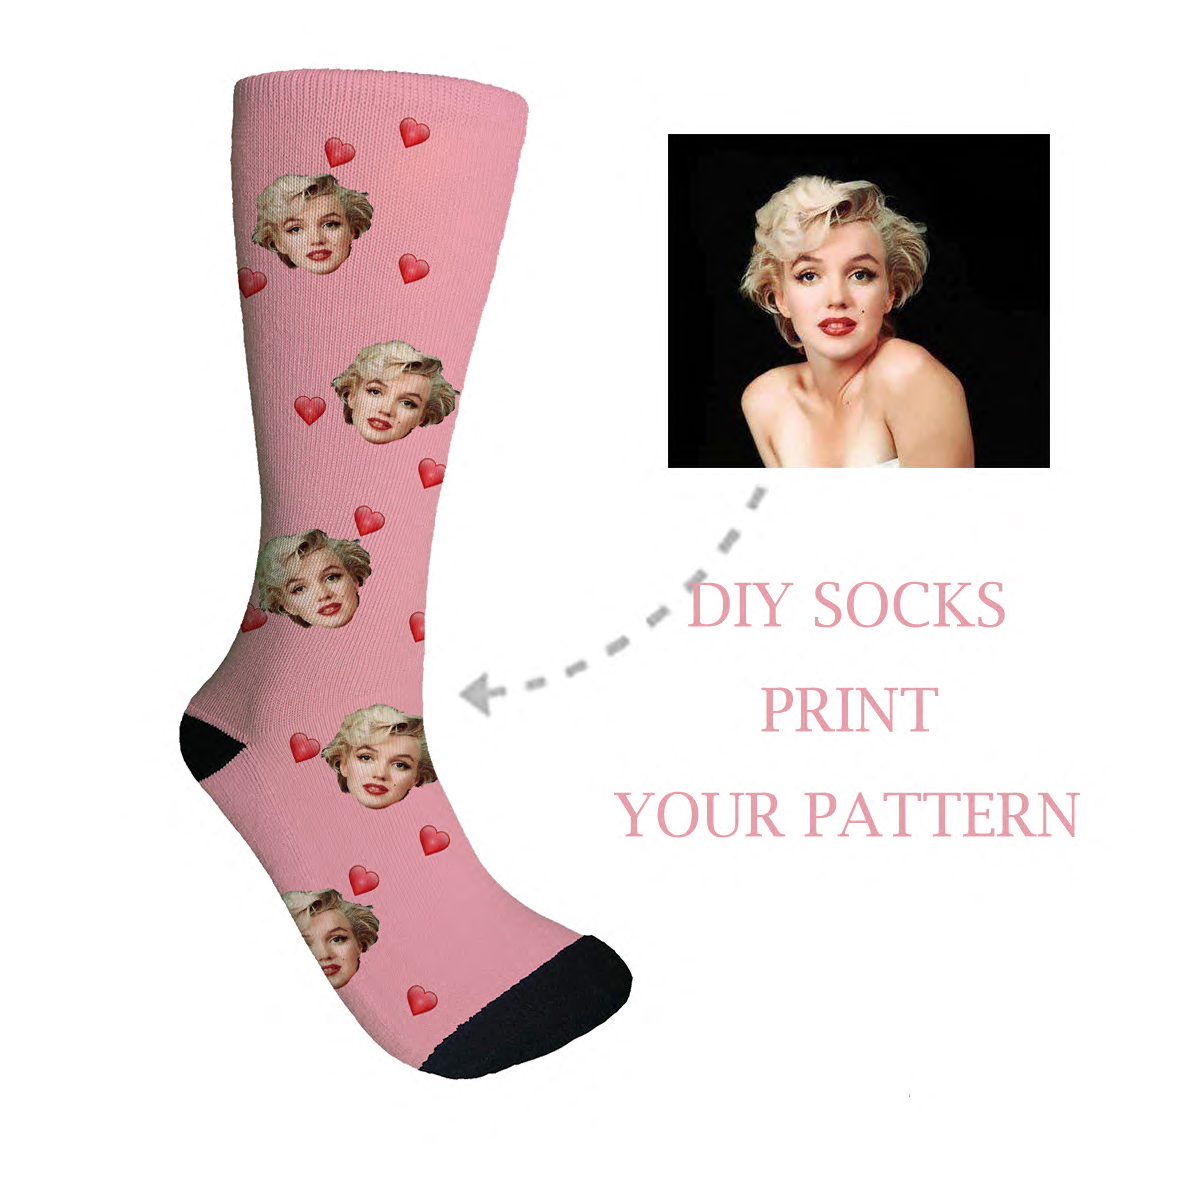 3D Diy Printed Personalized Custom Socks Women Long Socks Custom Men's Sport Socks Personalized Knee Socks Custom Gifts